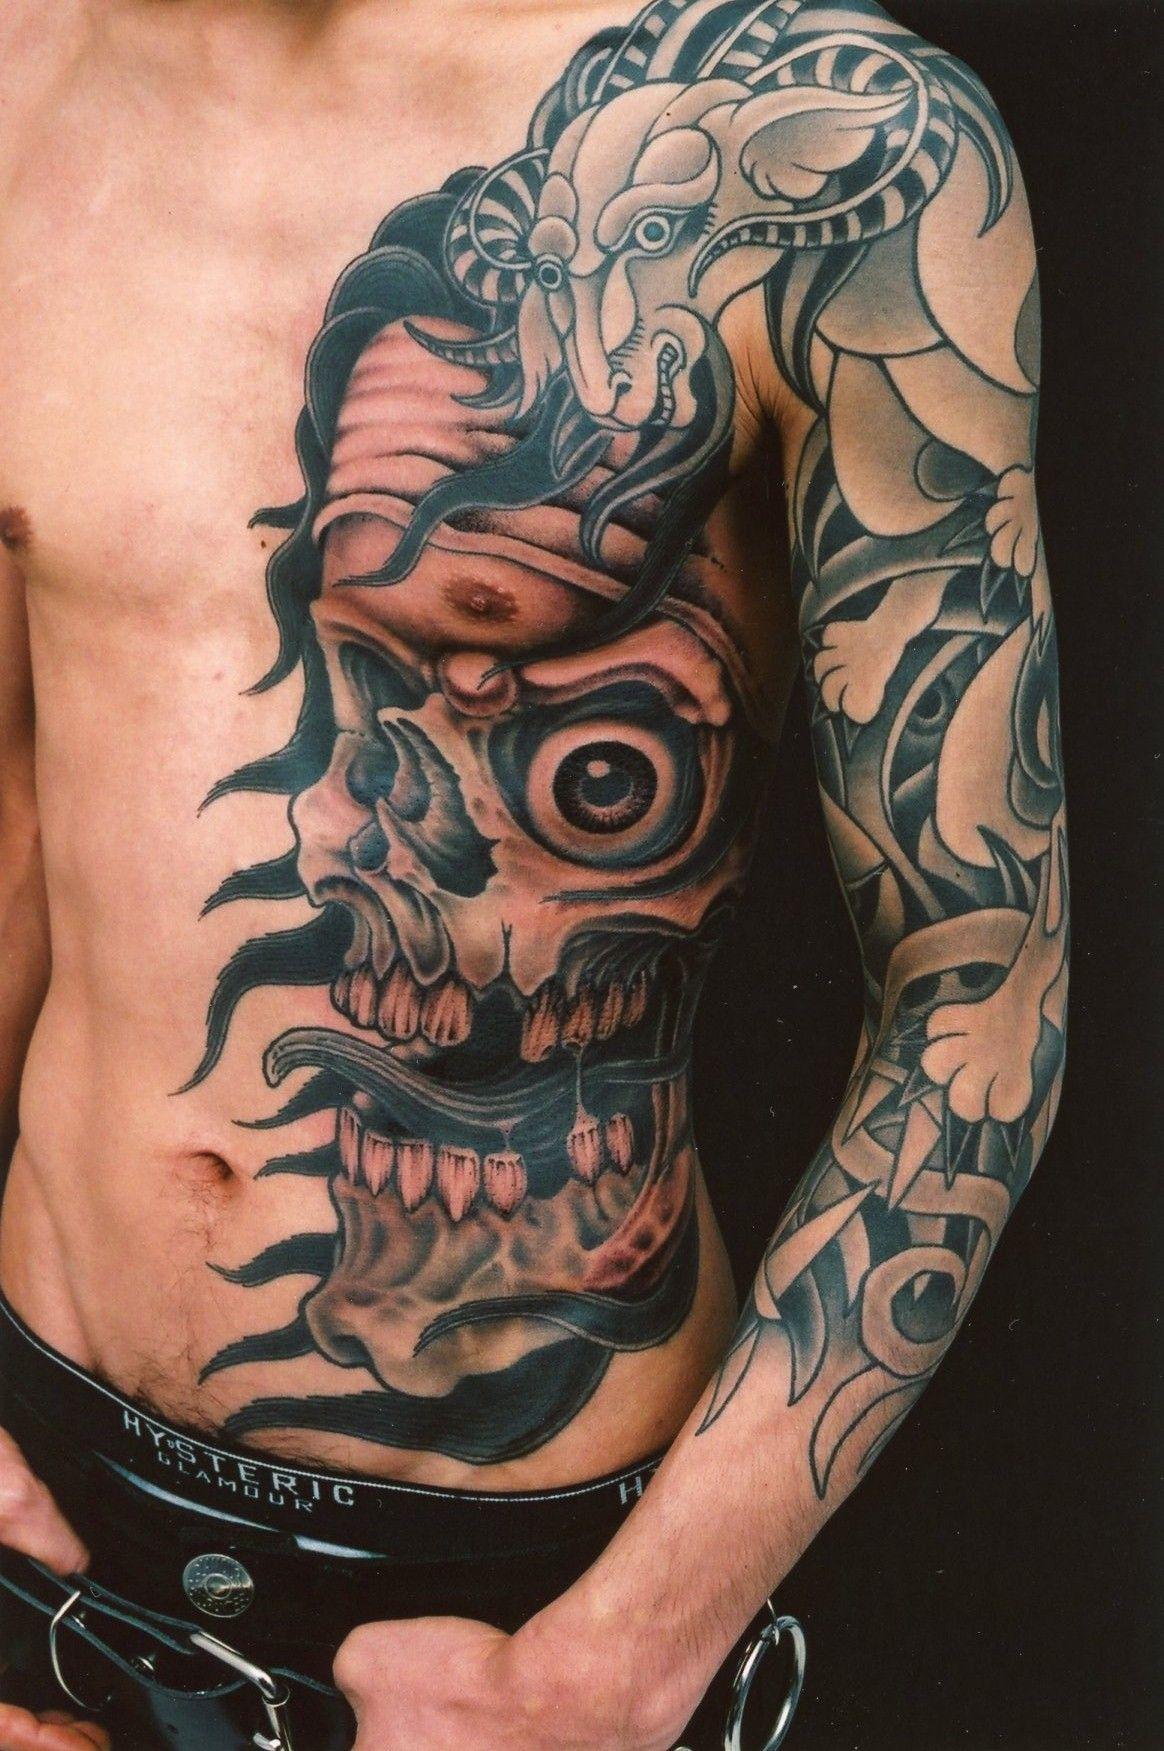 69 Cool Chest Tattoos: Http://sicktattoos.org/chest